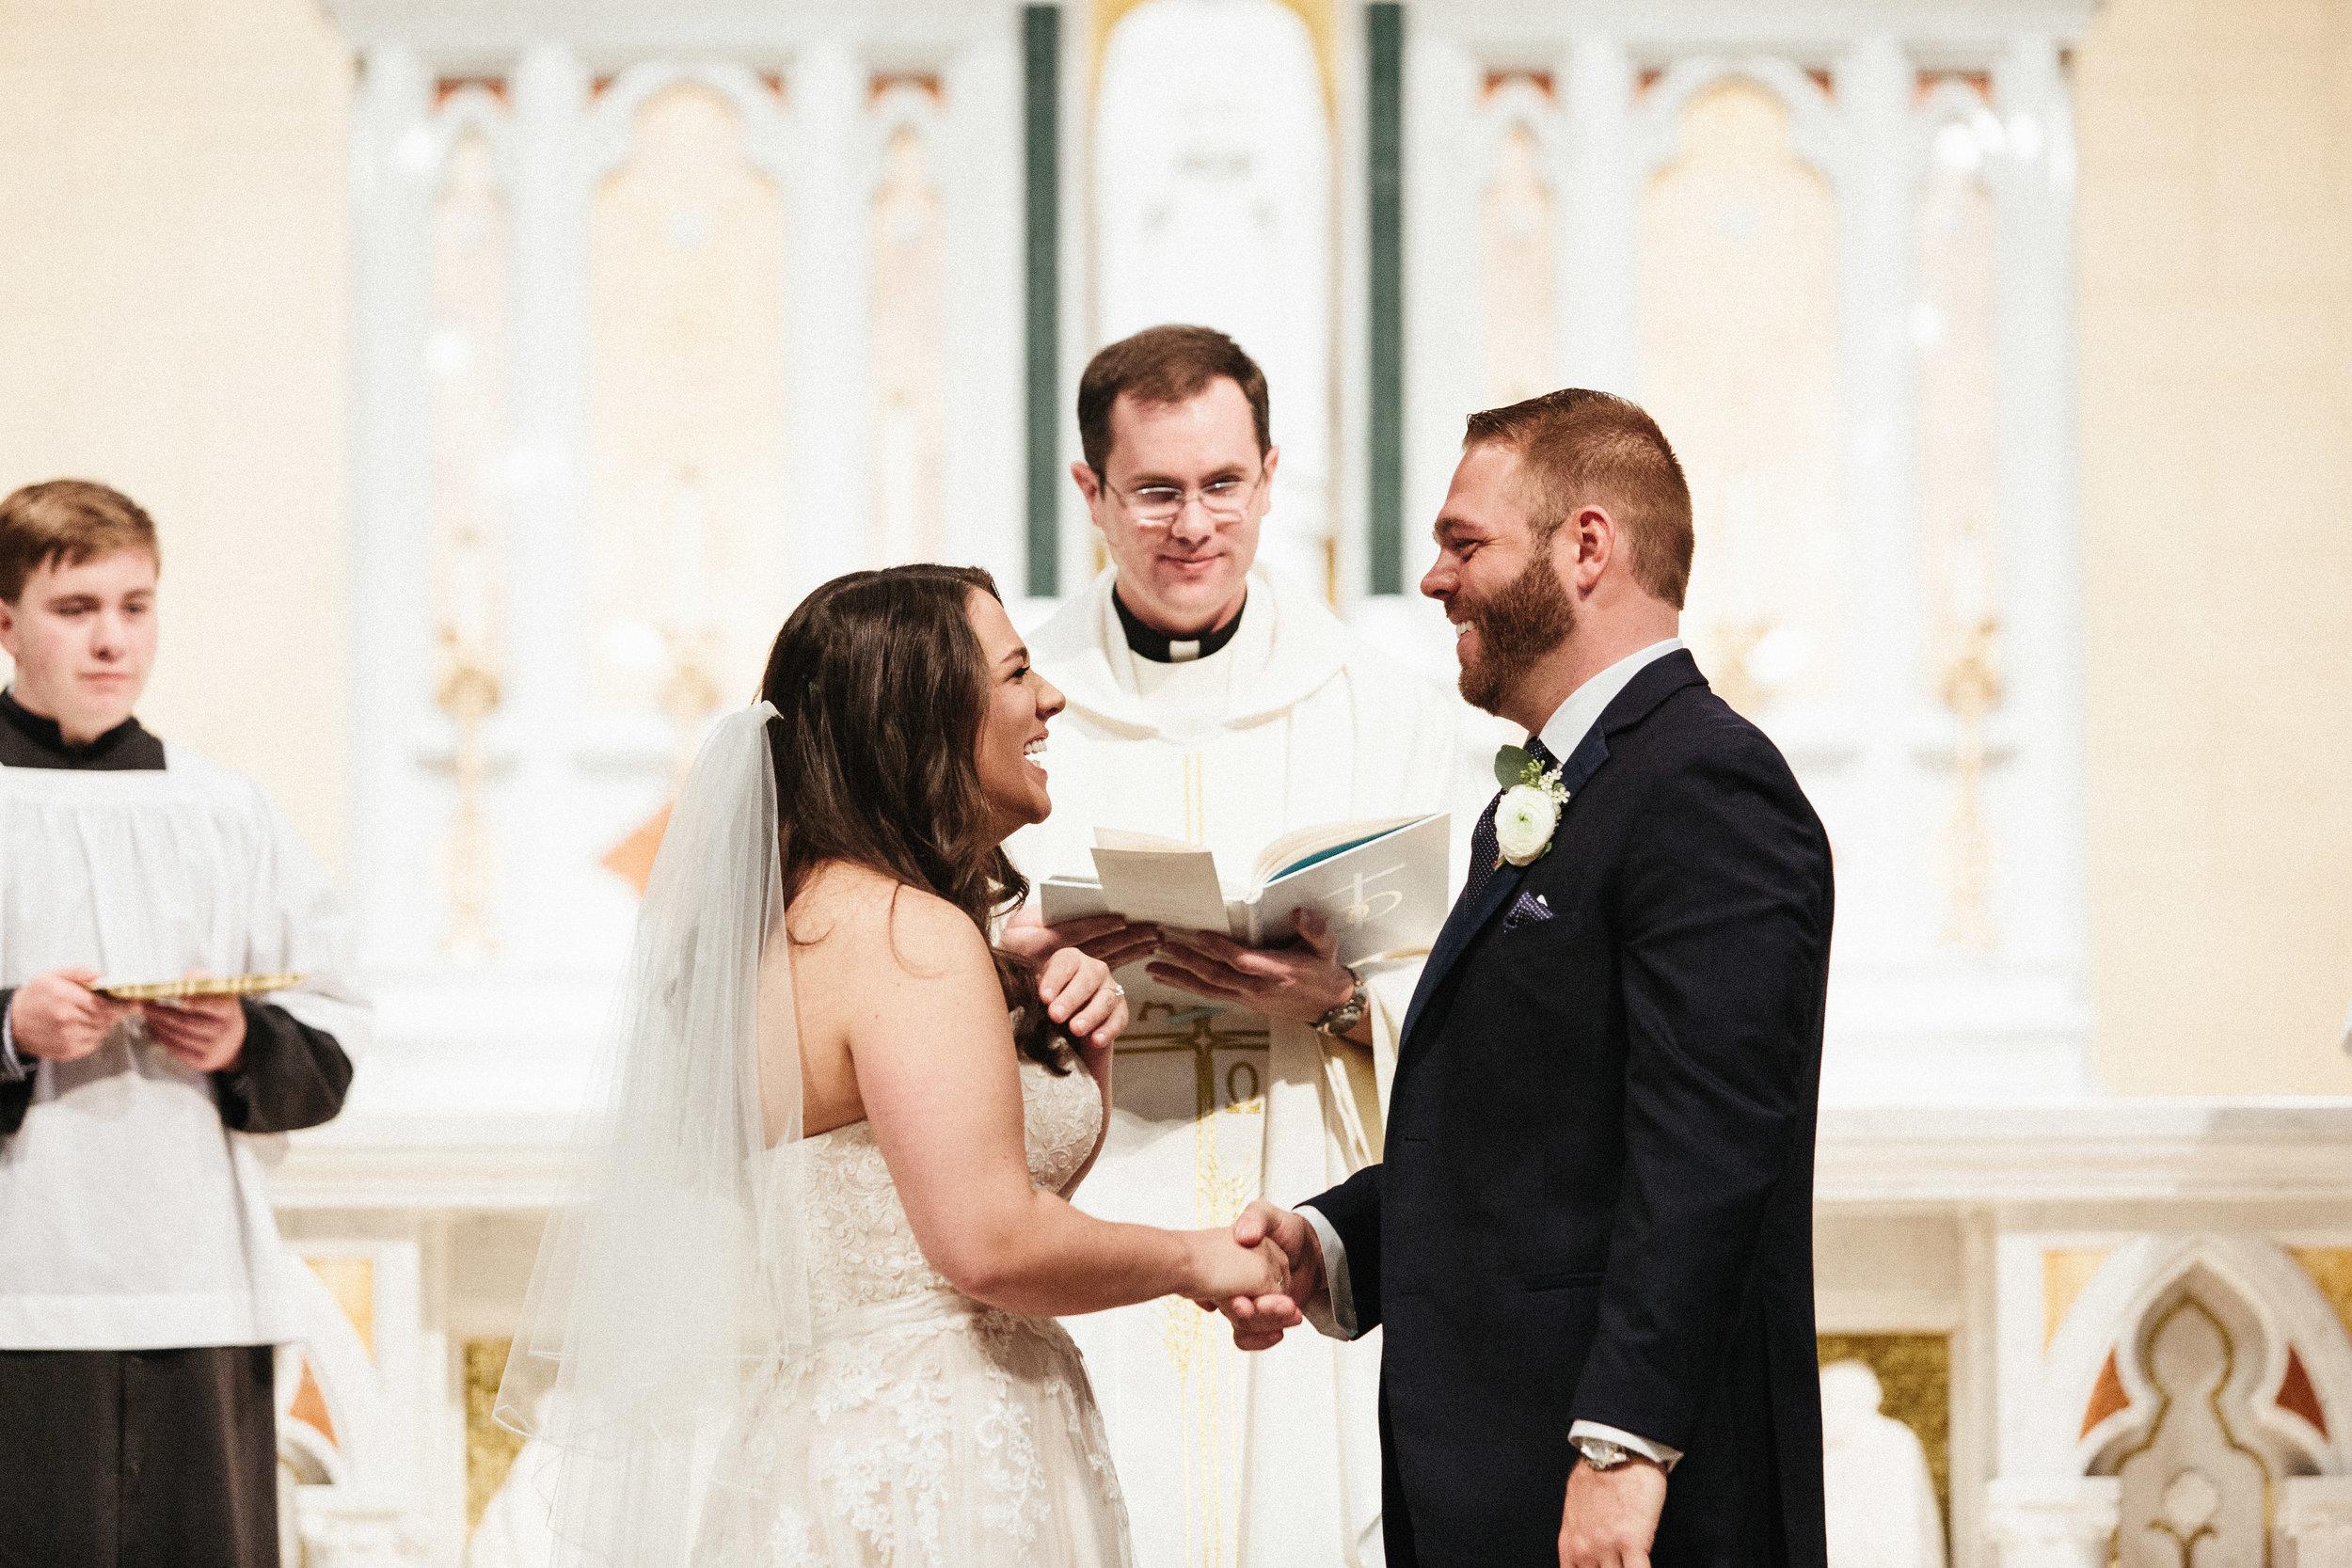 roswell_st_peter_chanel_catholic_avalon_hotel_alpharetta_wedding-1512.jpg